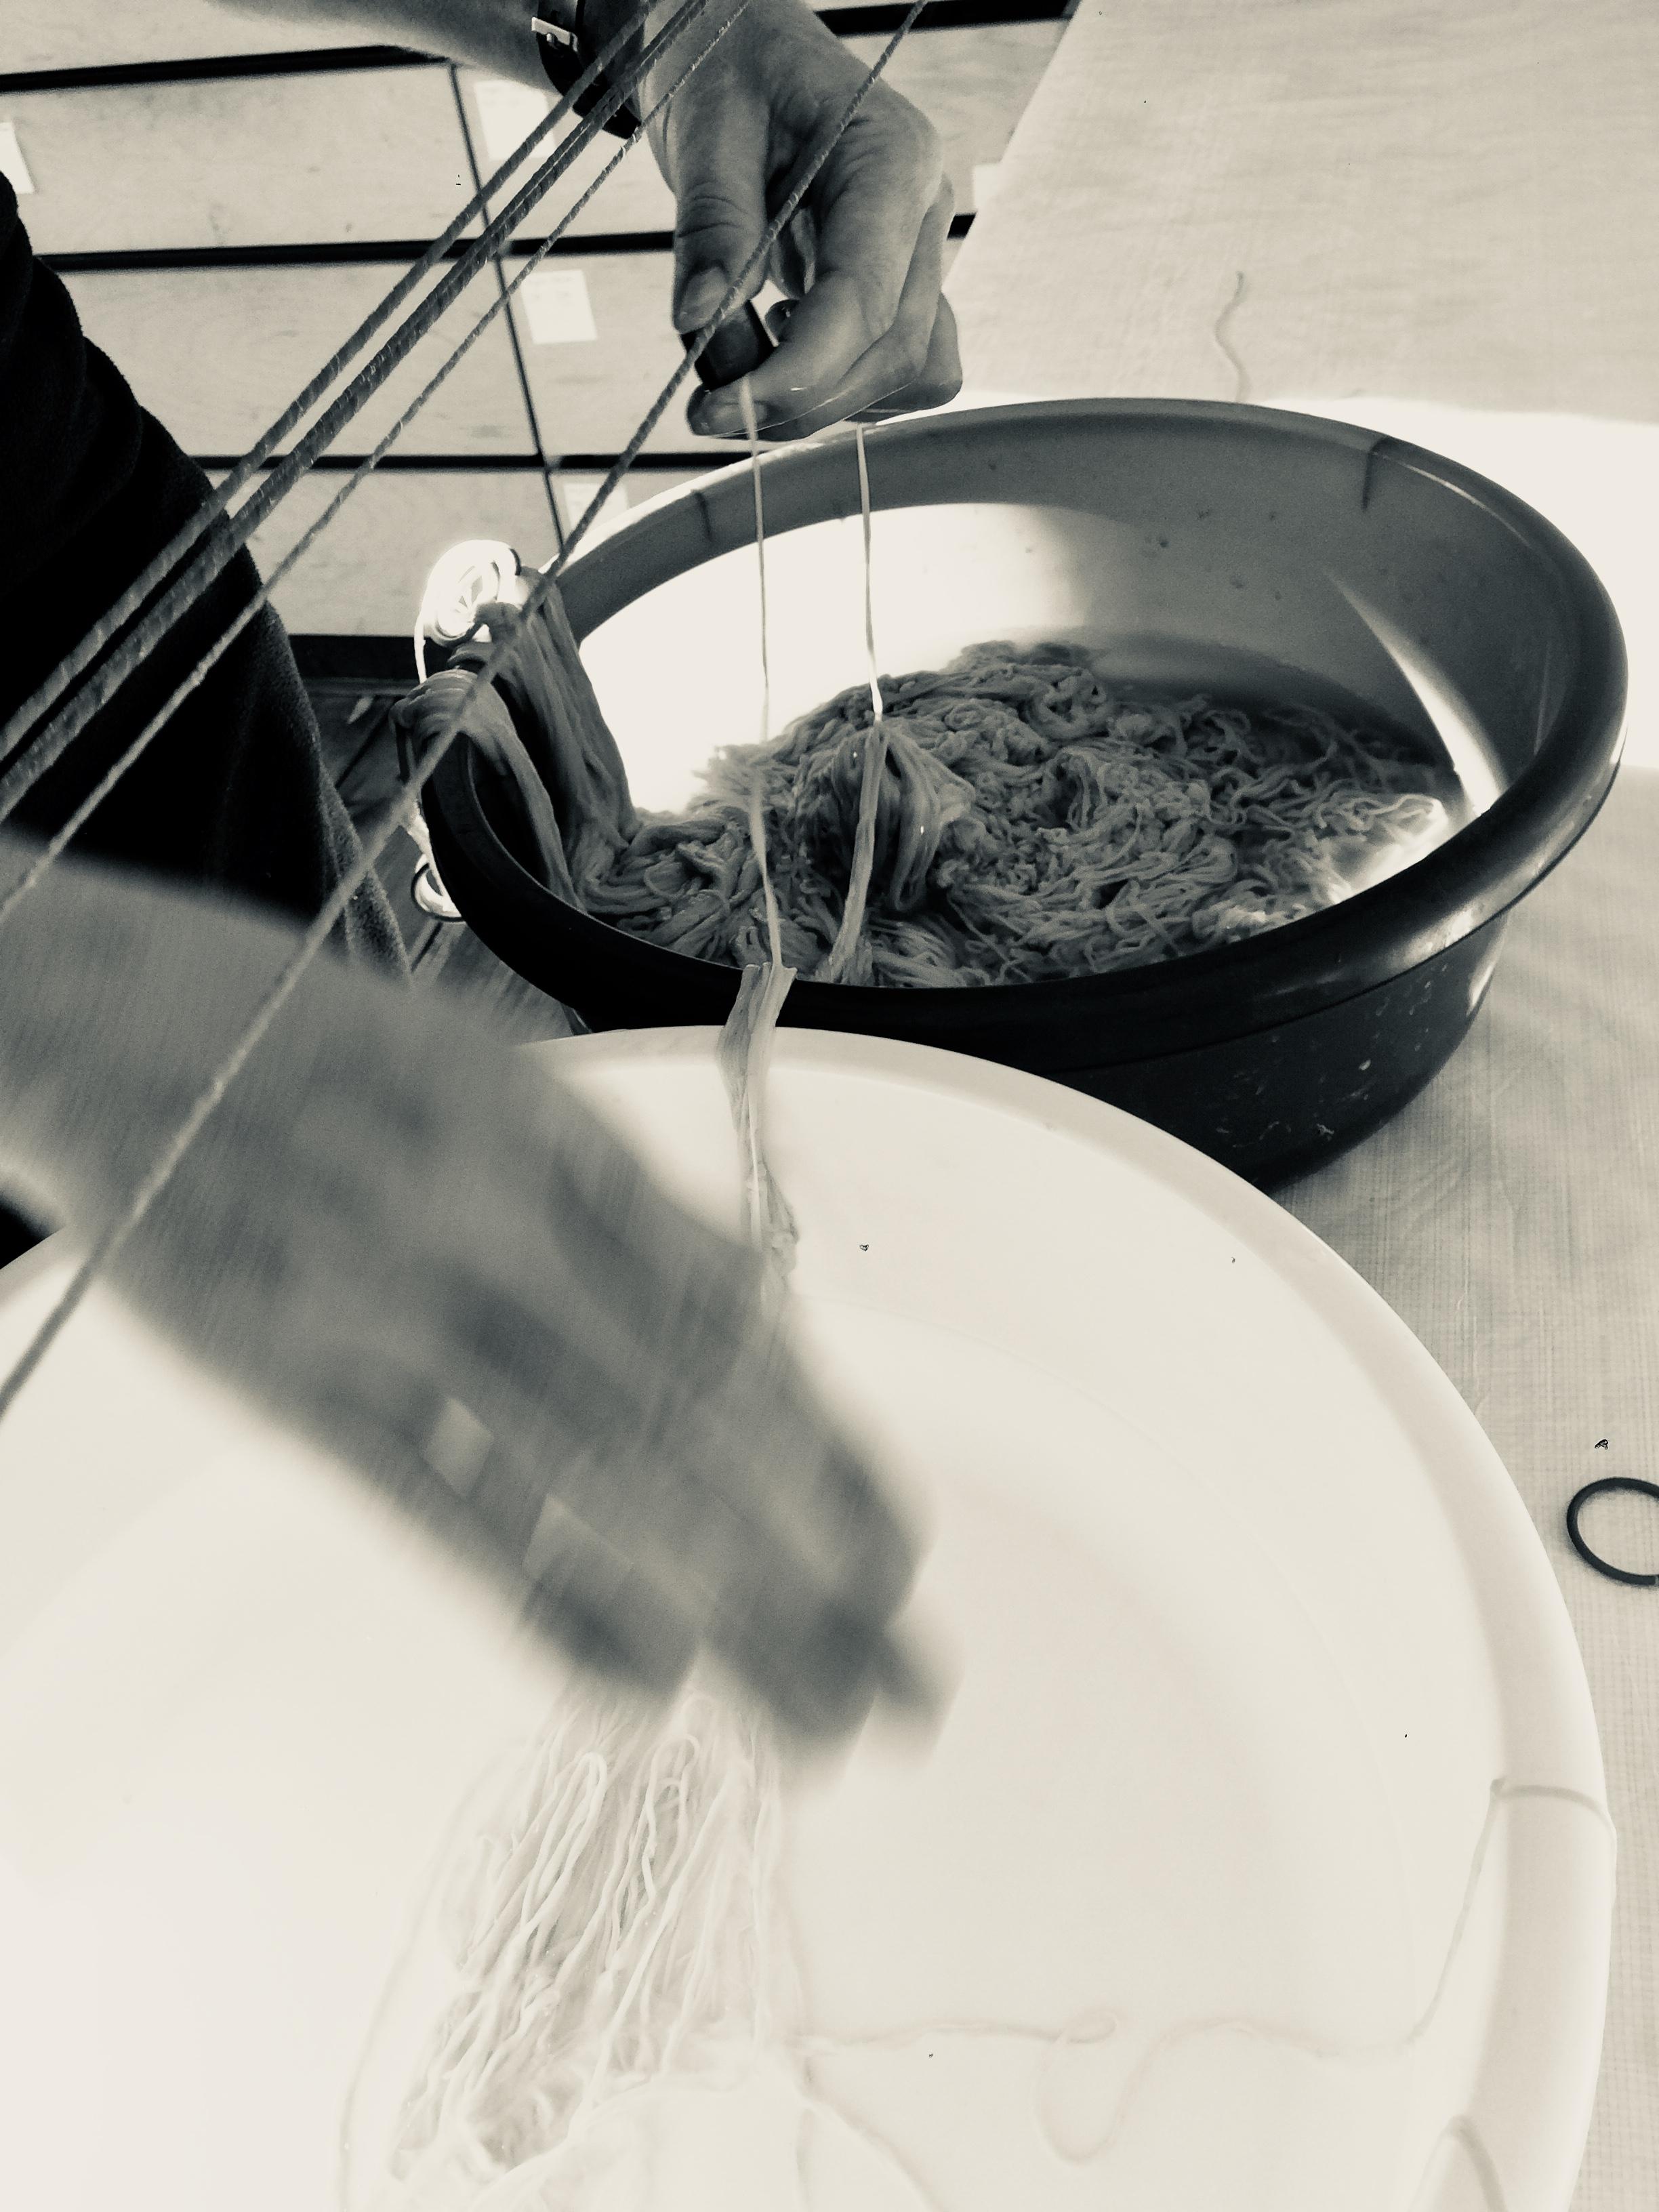 Barocksaiten Herstellung, Pure Corde Darmsaiten, gutstrings, stringmaker